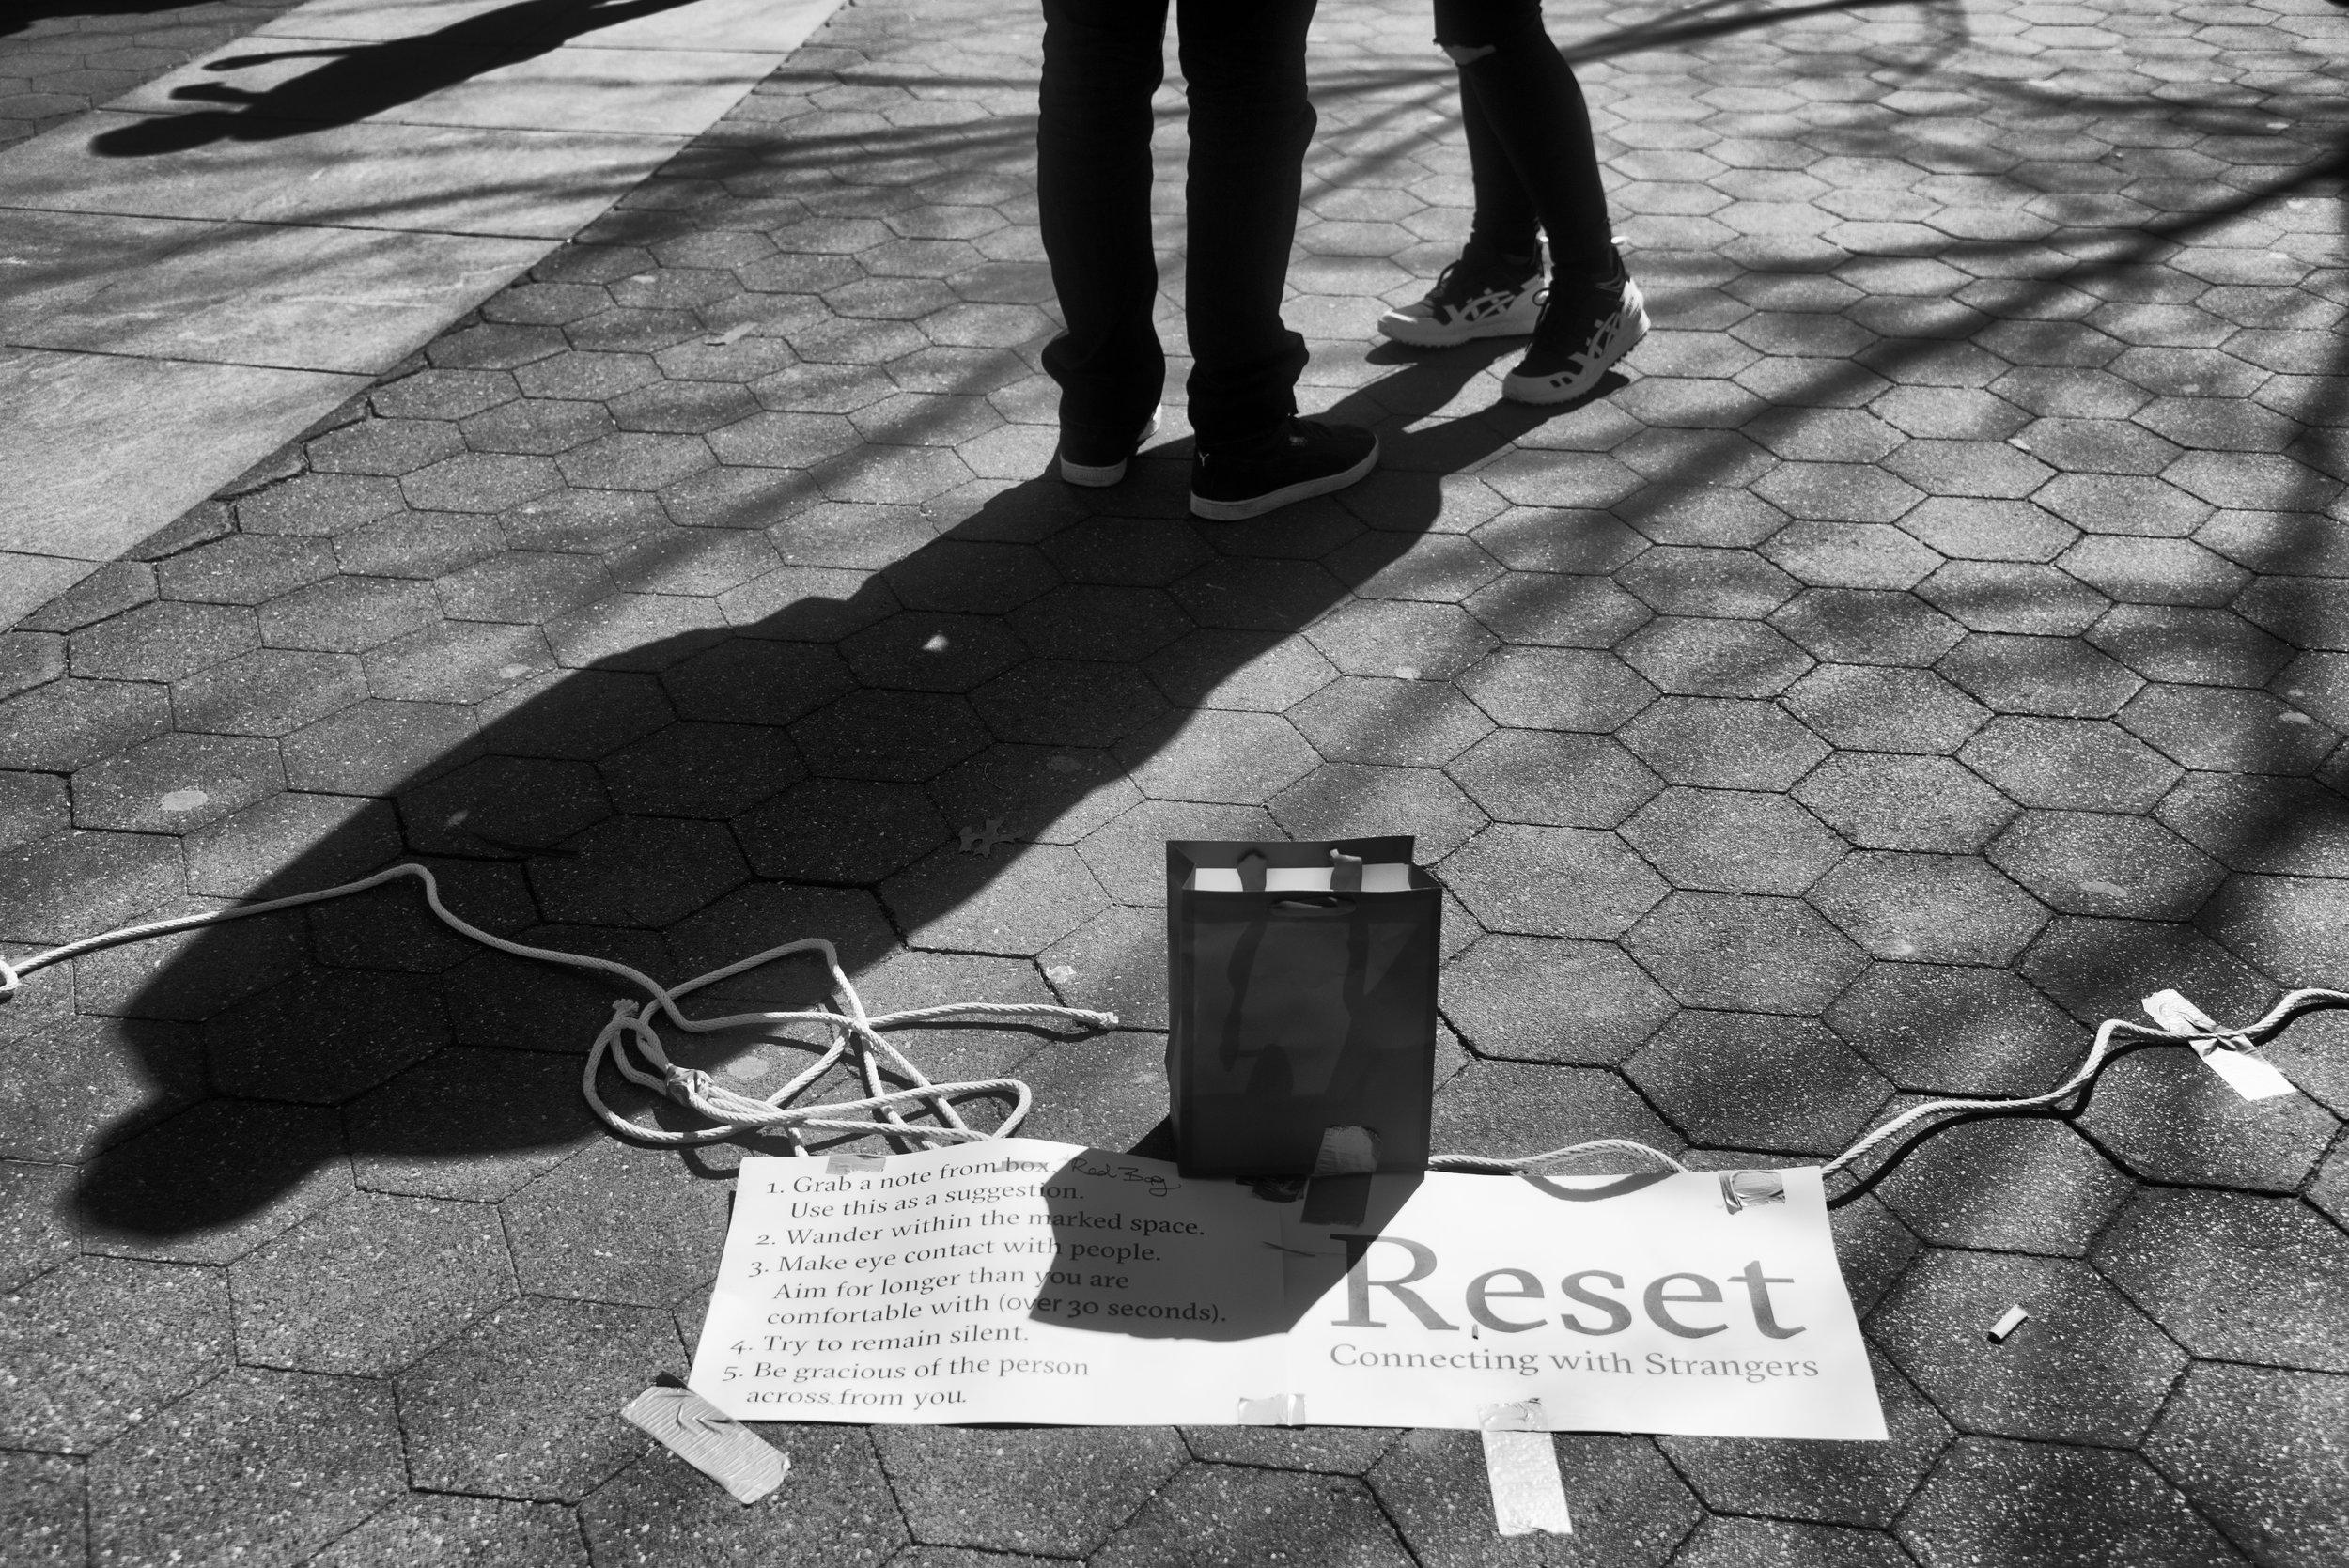 reset (1 of 1).jpg